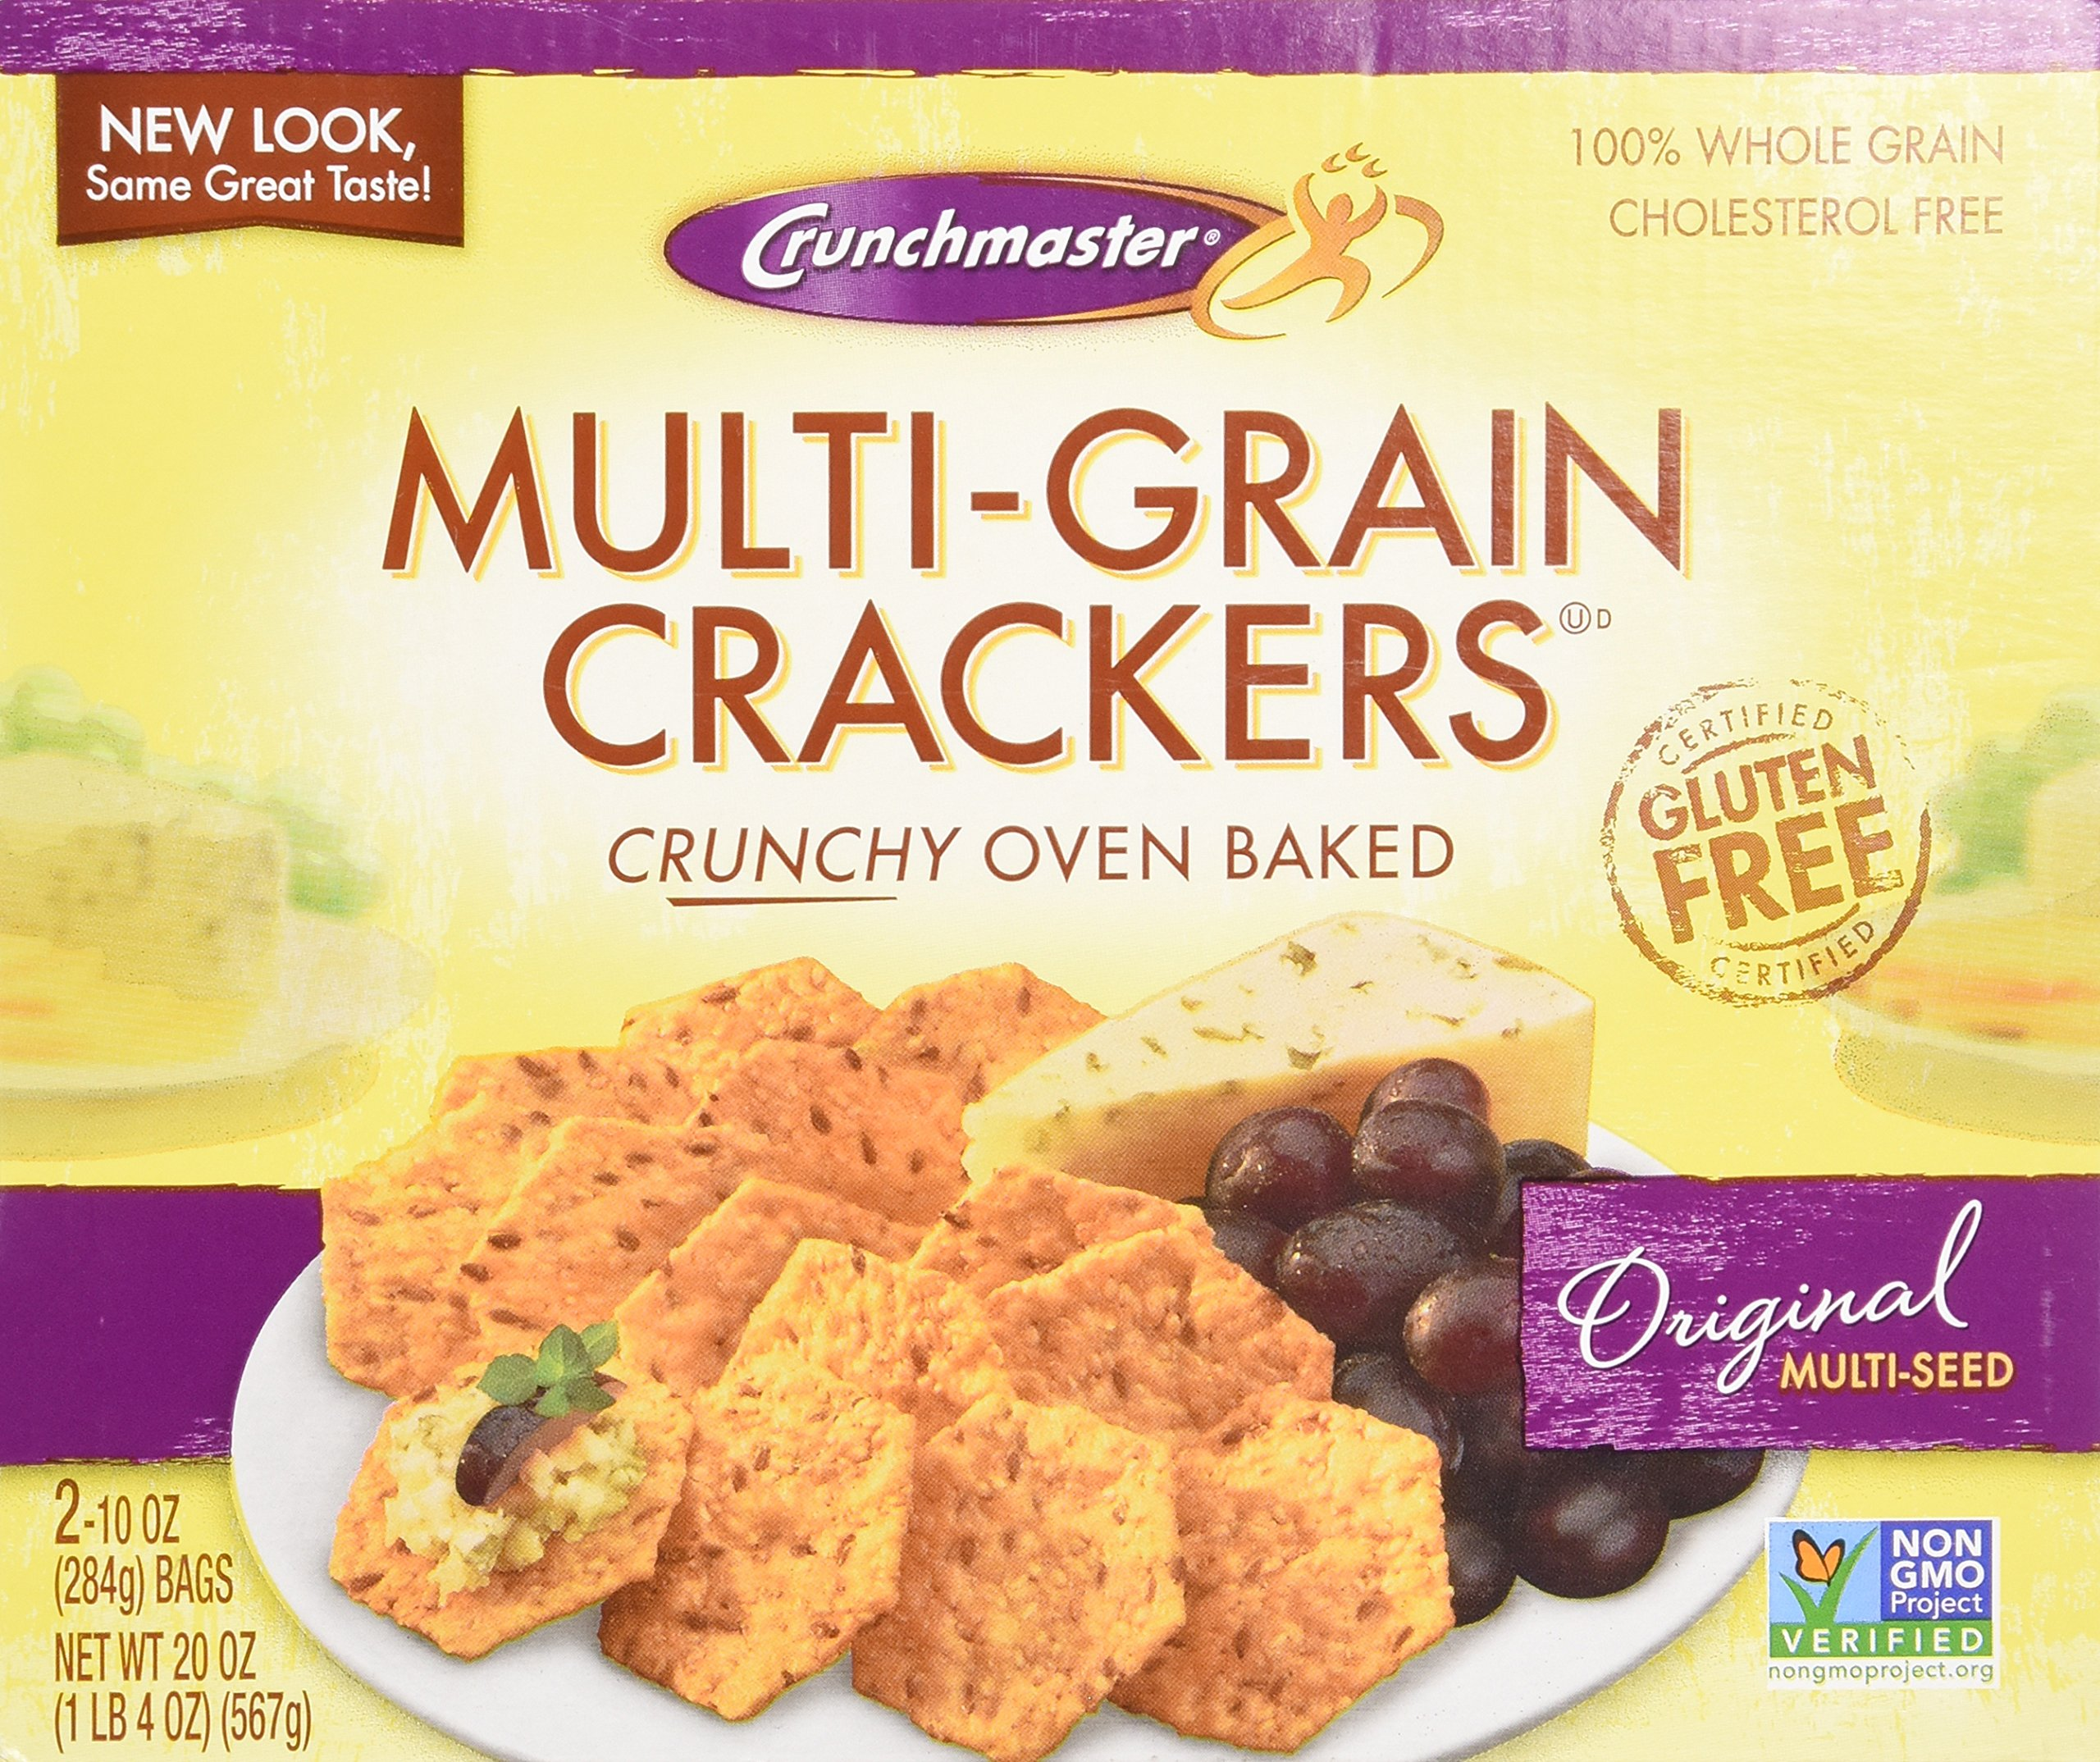 Crunchmaster Multi-Grain Crackers, Gluten Free, 20 oz. by Crunchmaster